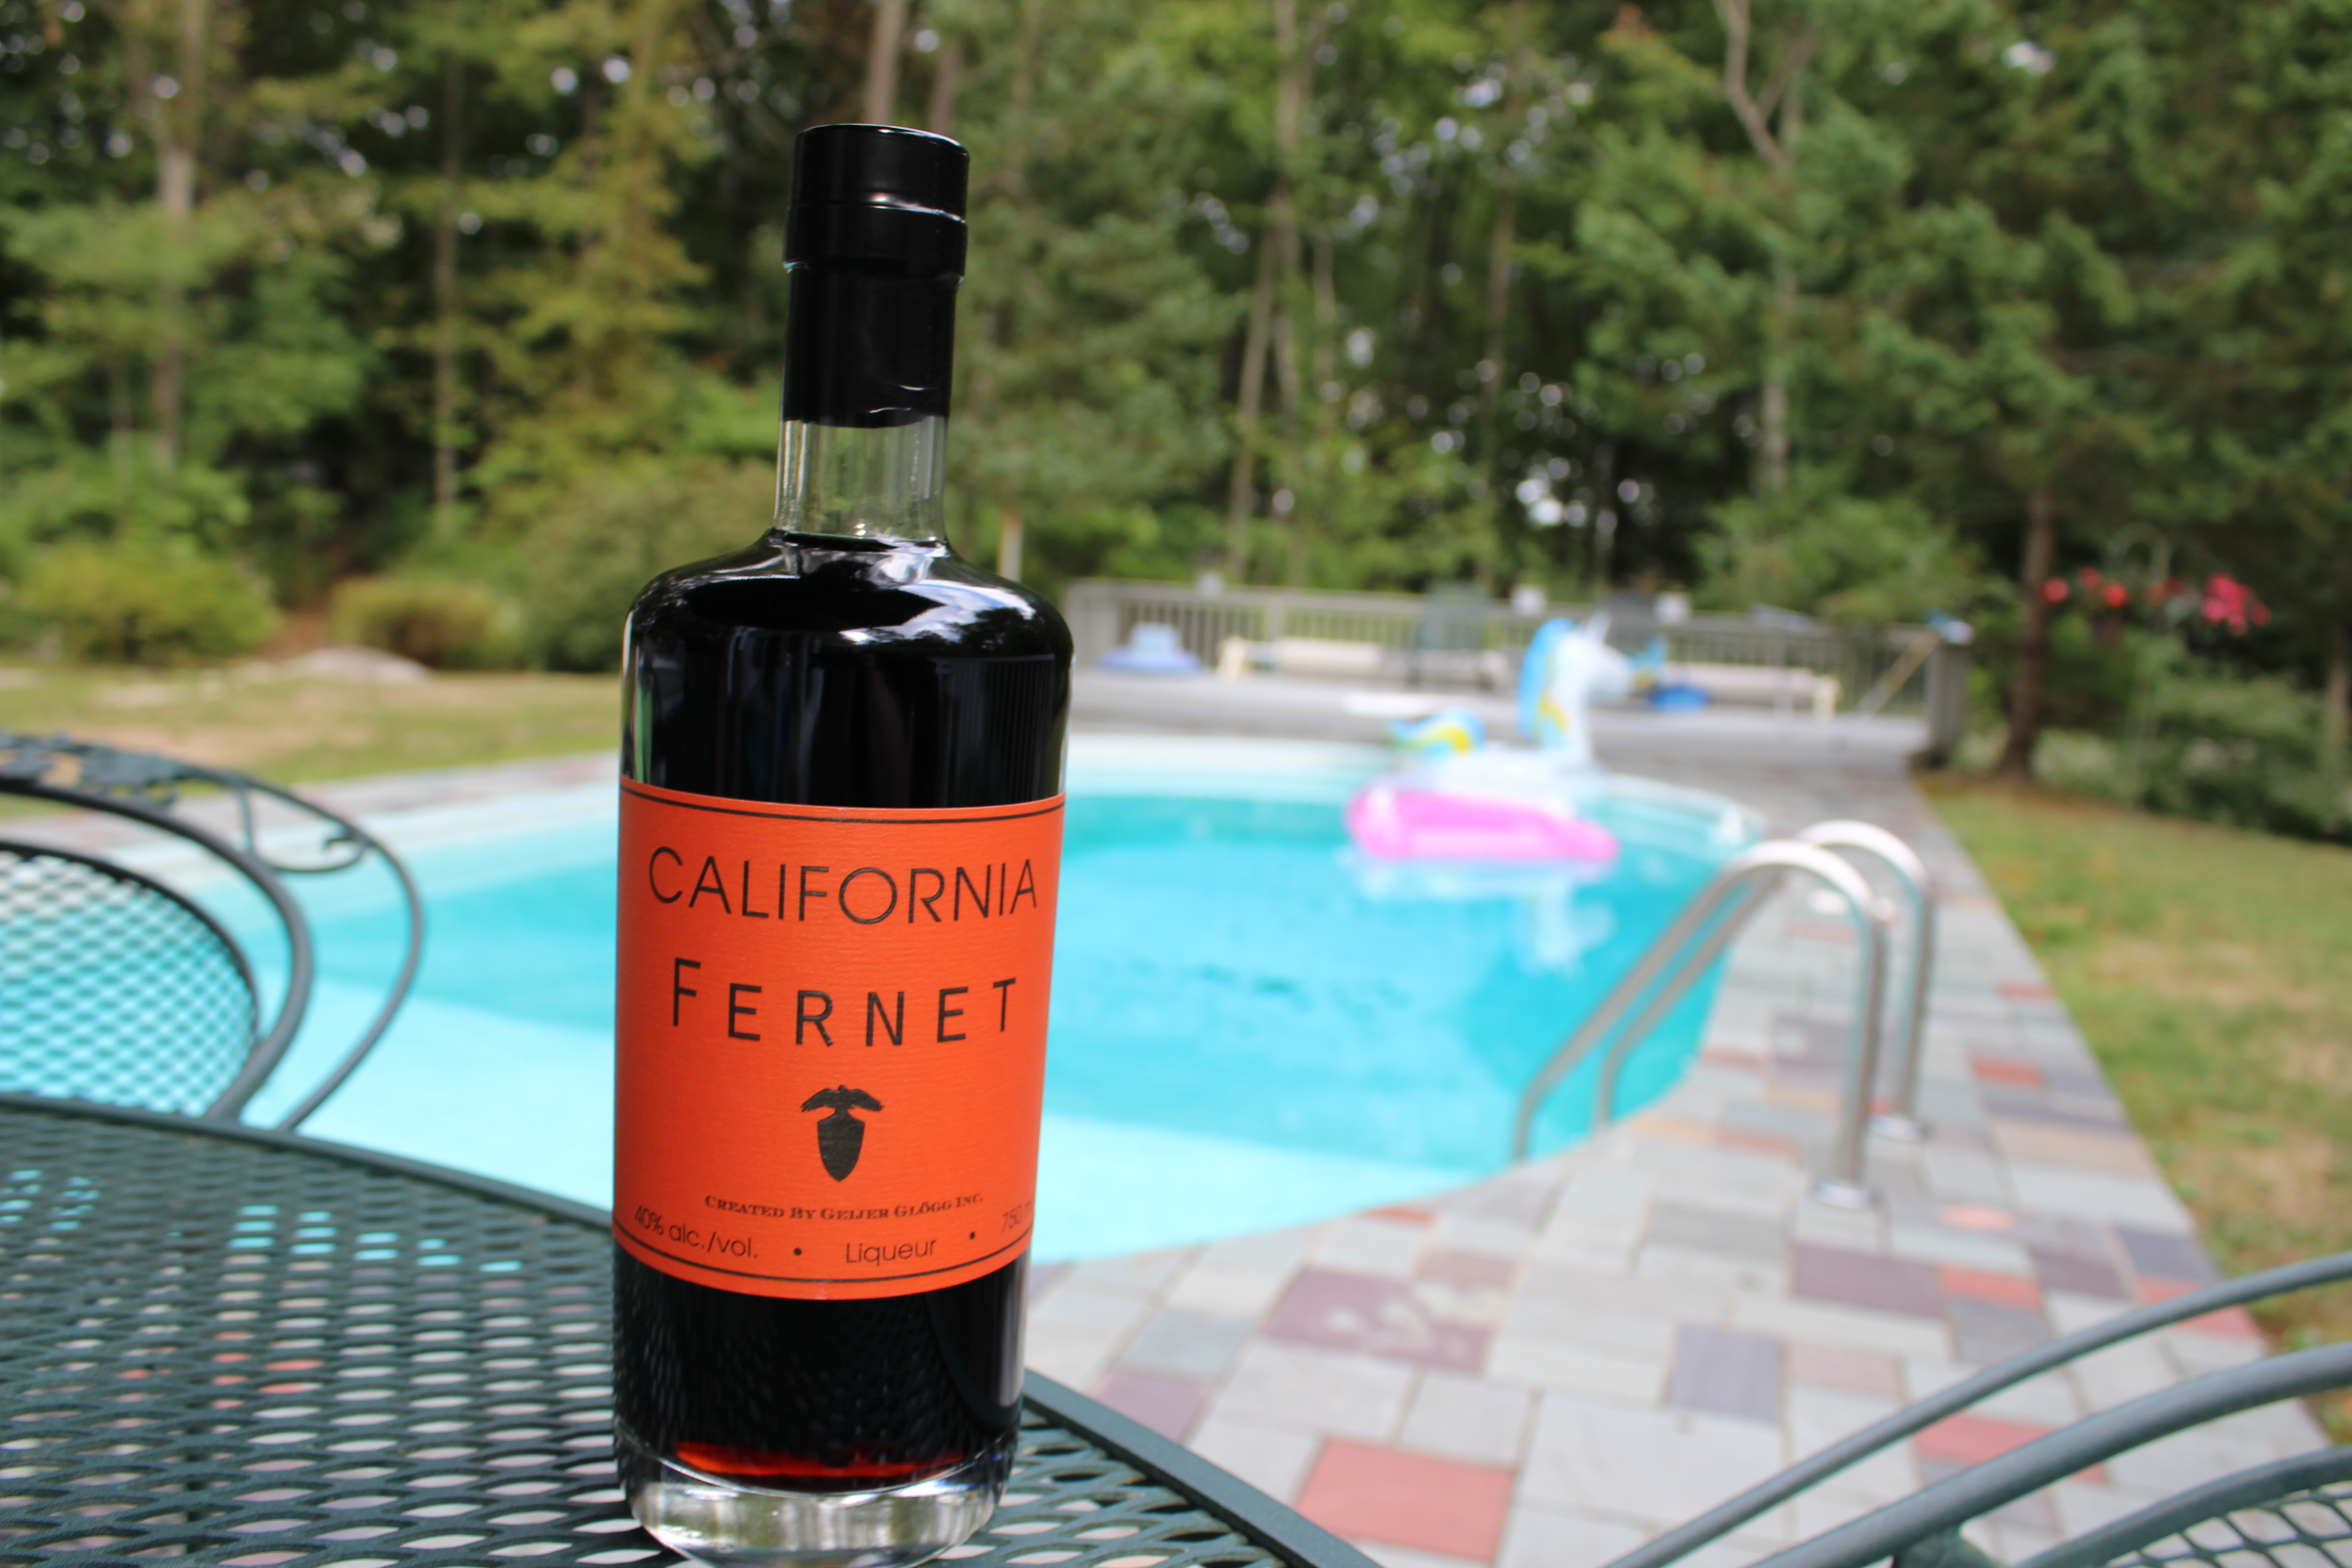 California Fernet